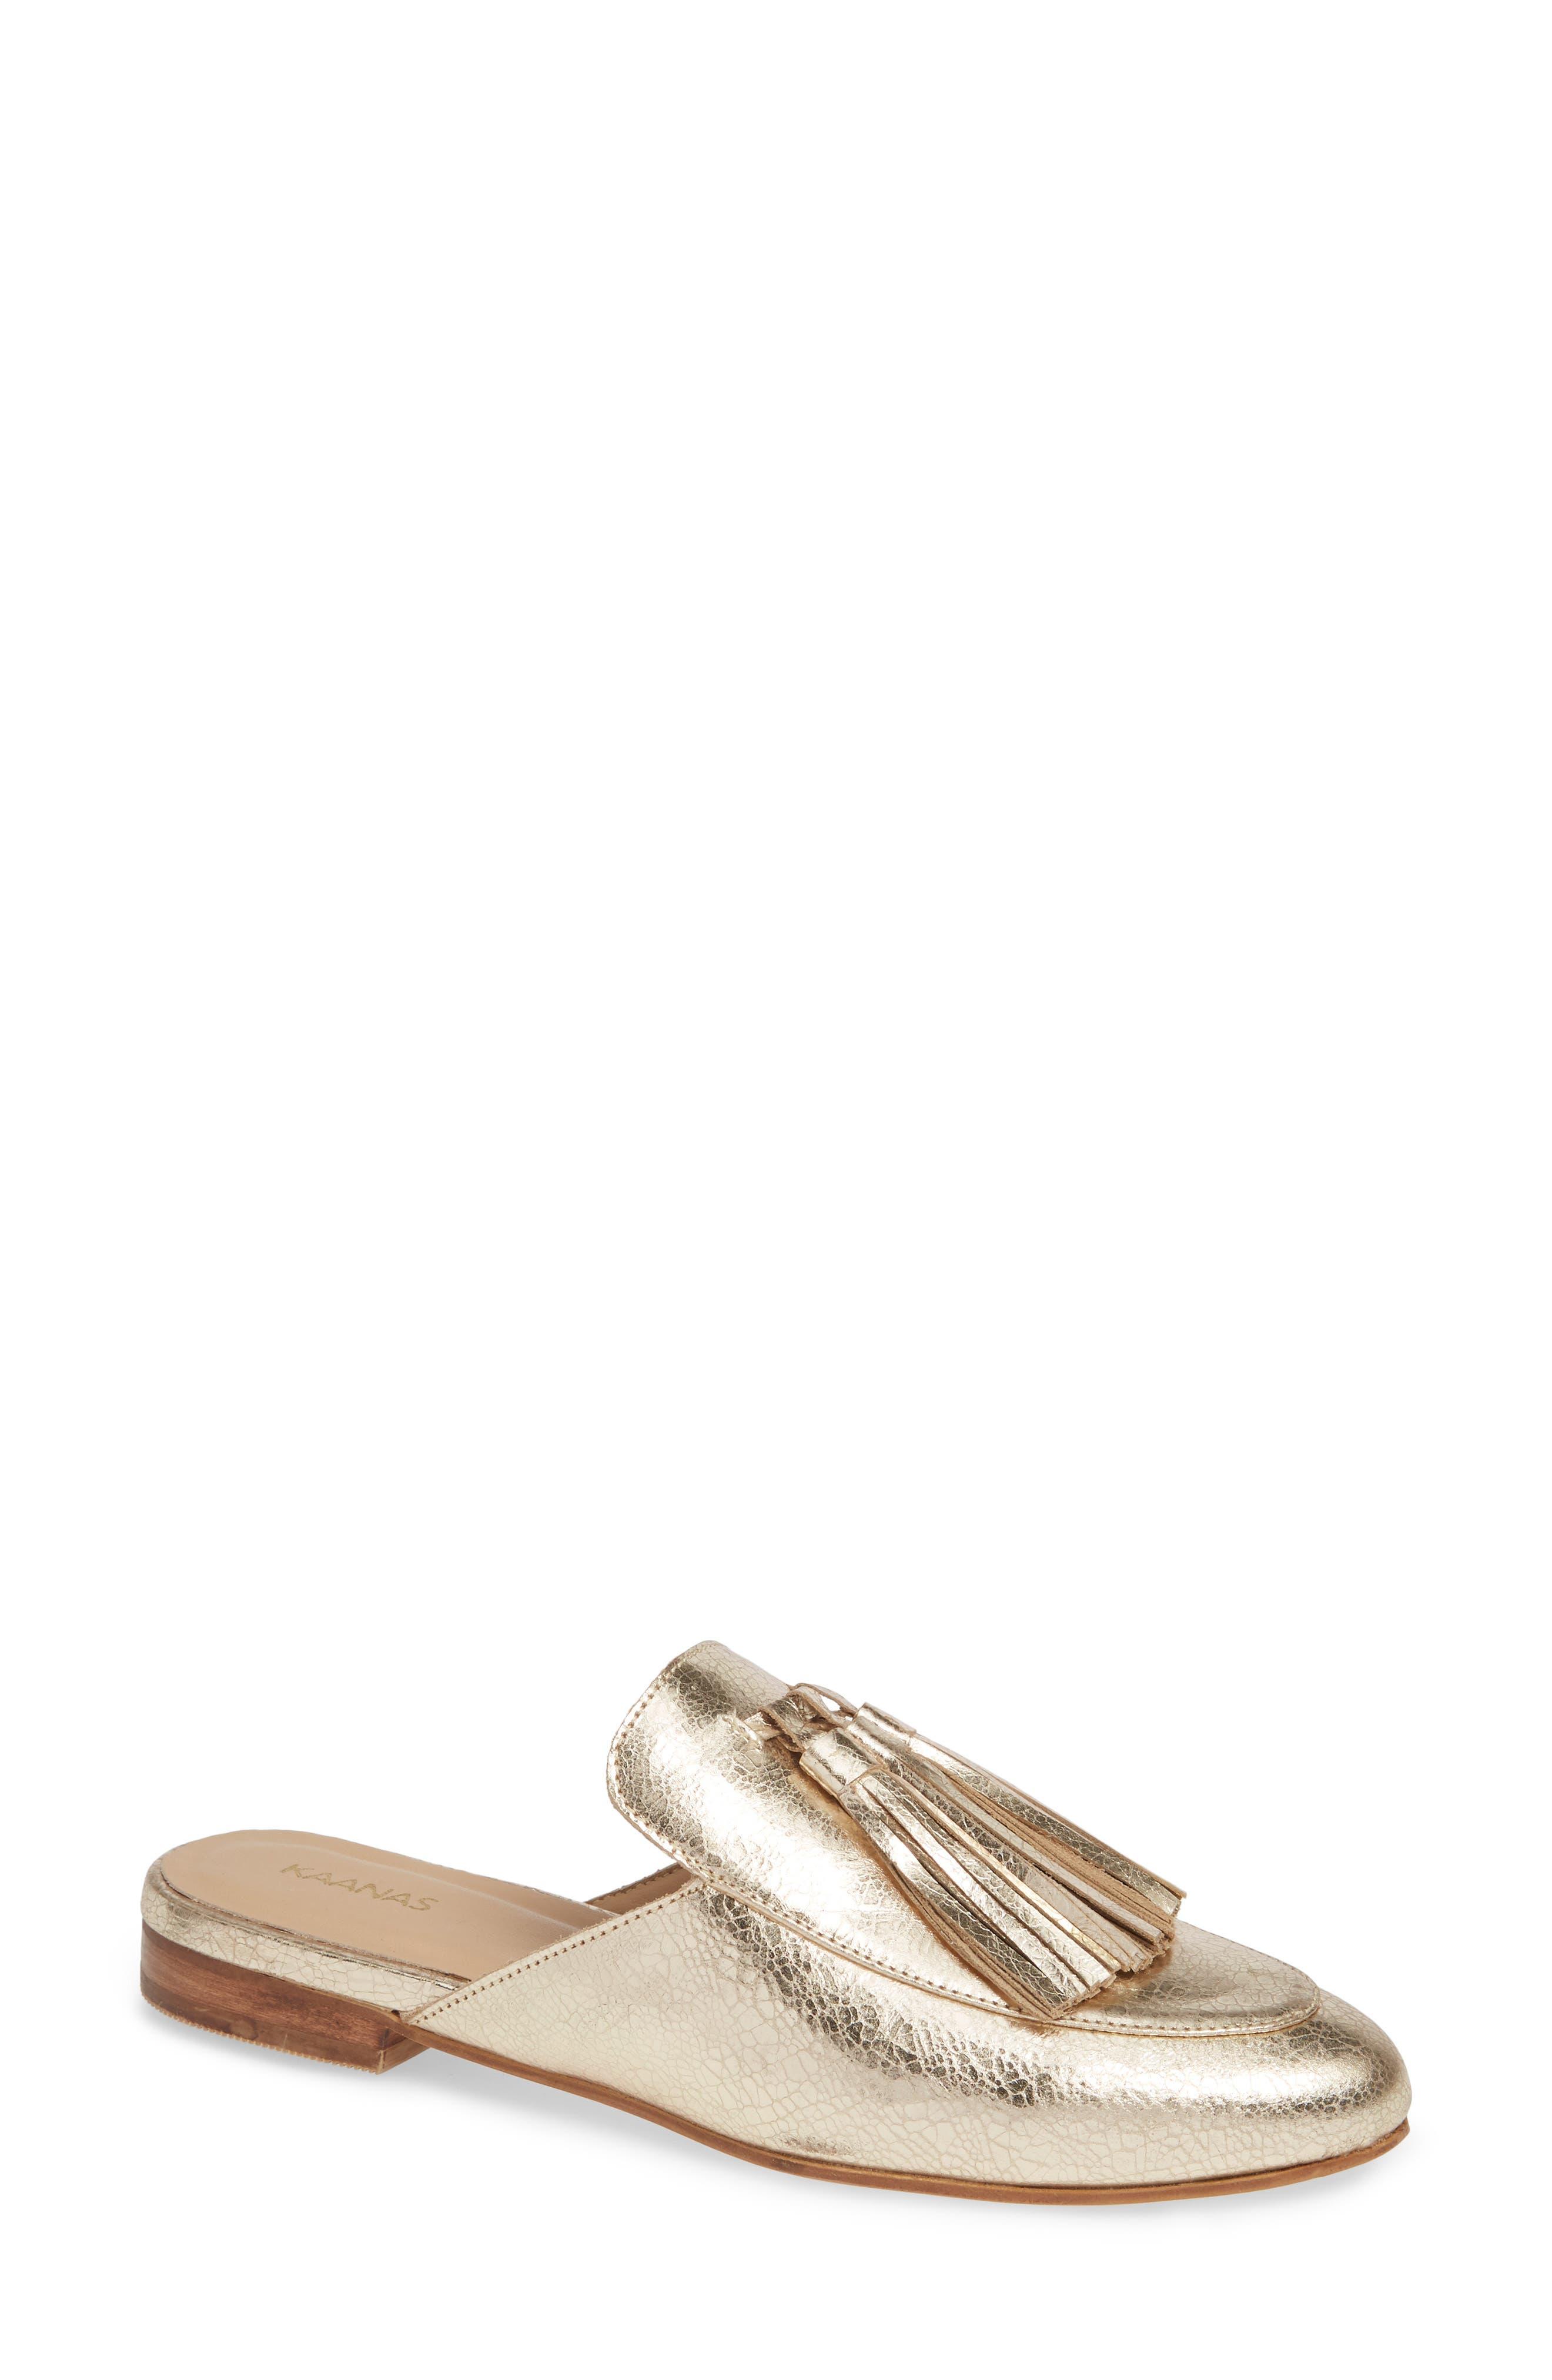 KAANAS Kingston Tasseled Mule in Gold Leather